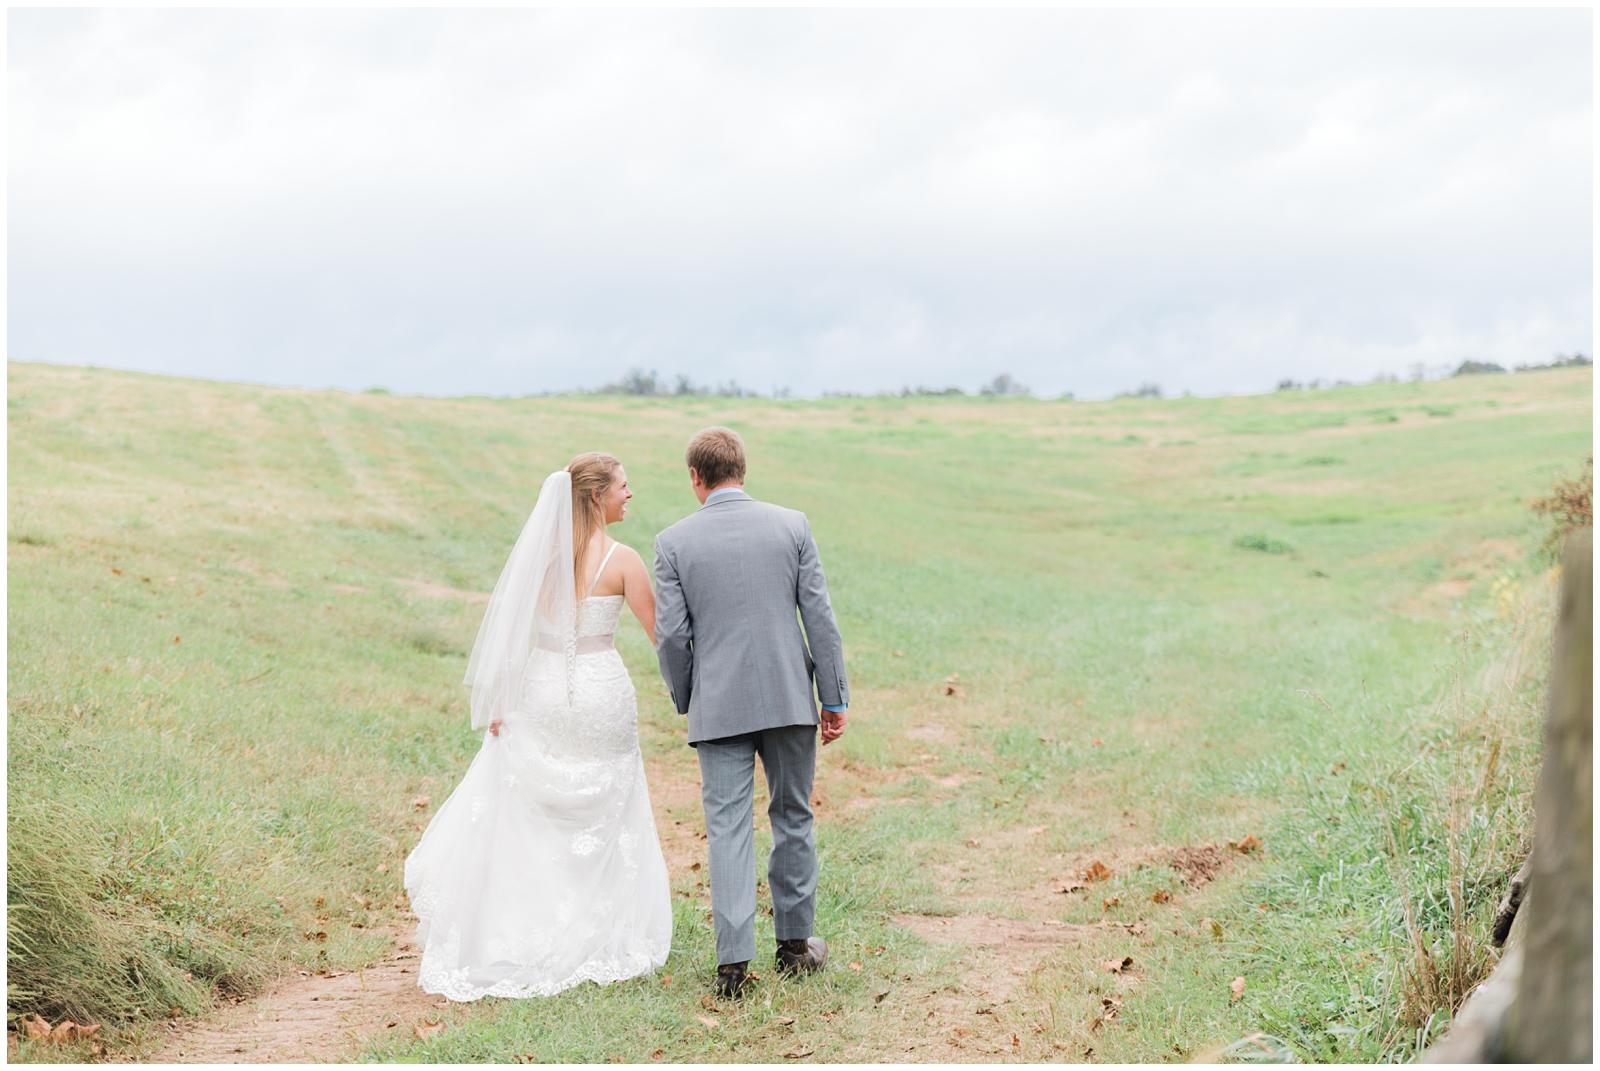 marietta-ohio-fall-wedding-LRA-Photo_0022.jpg